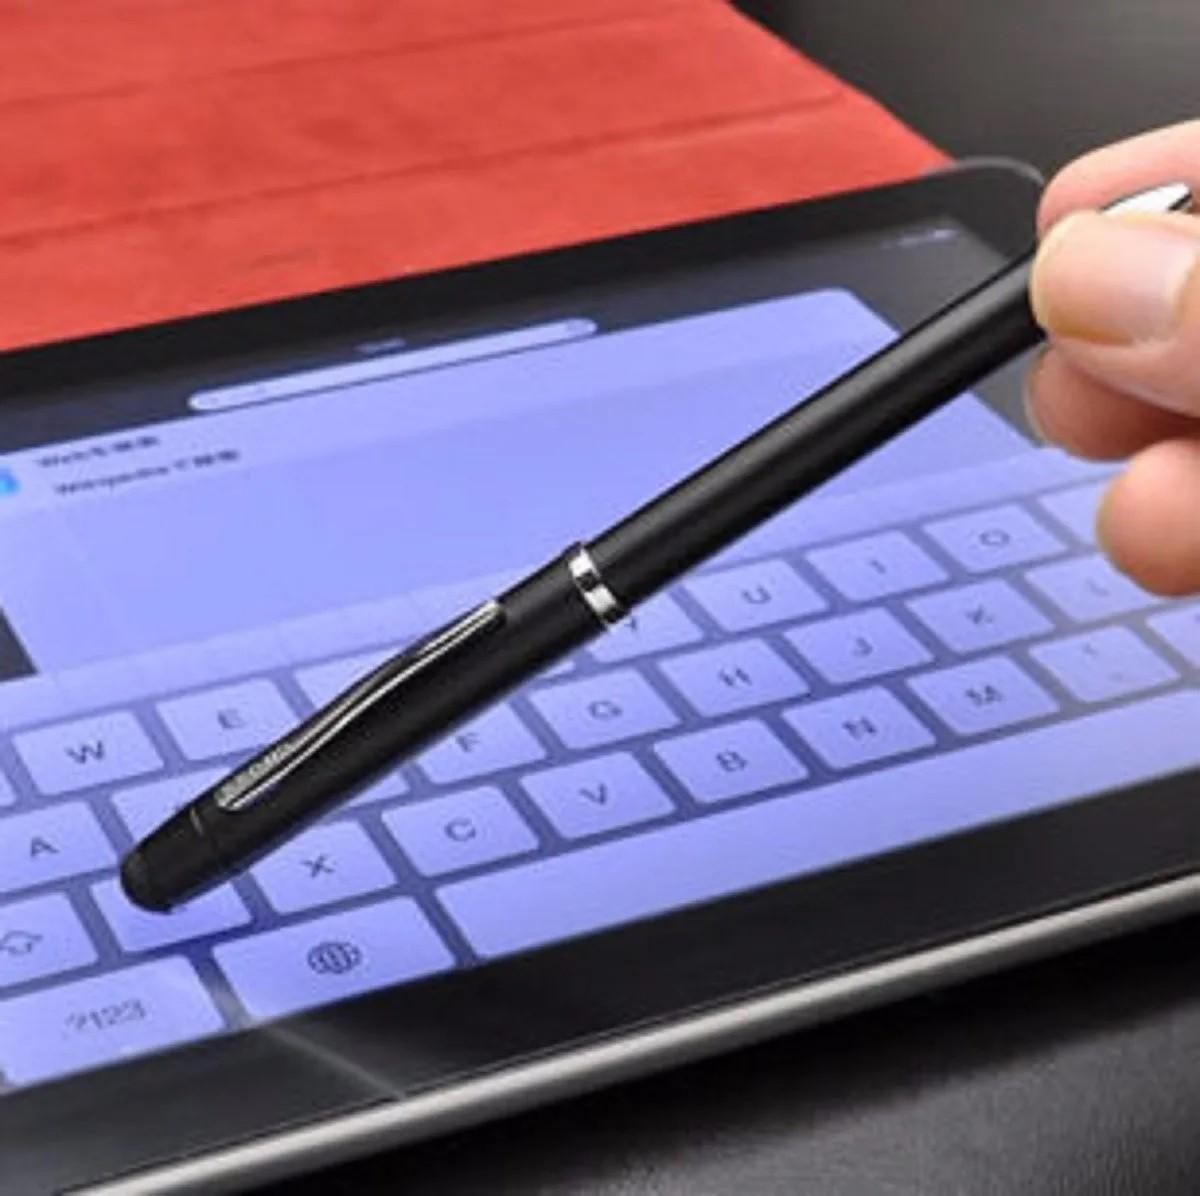 Caneta Cross Tech 3 Multifuncional 2 cores lapiseira e ponta touch AT0090-3  - Mix Eletro